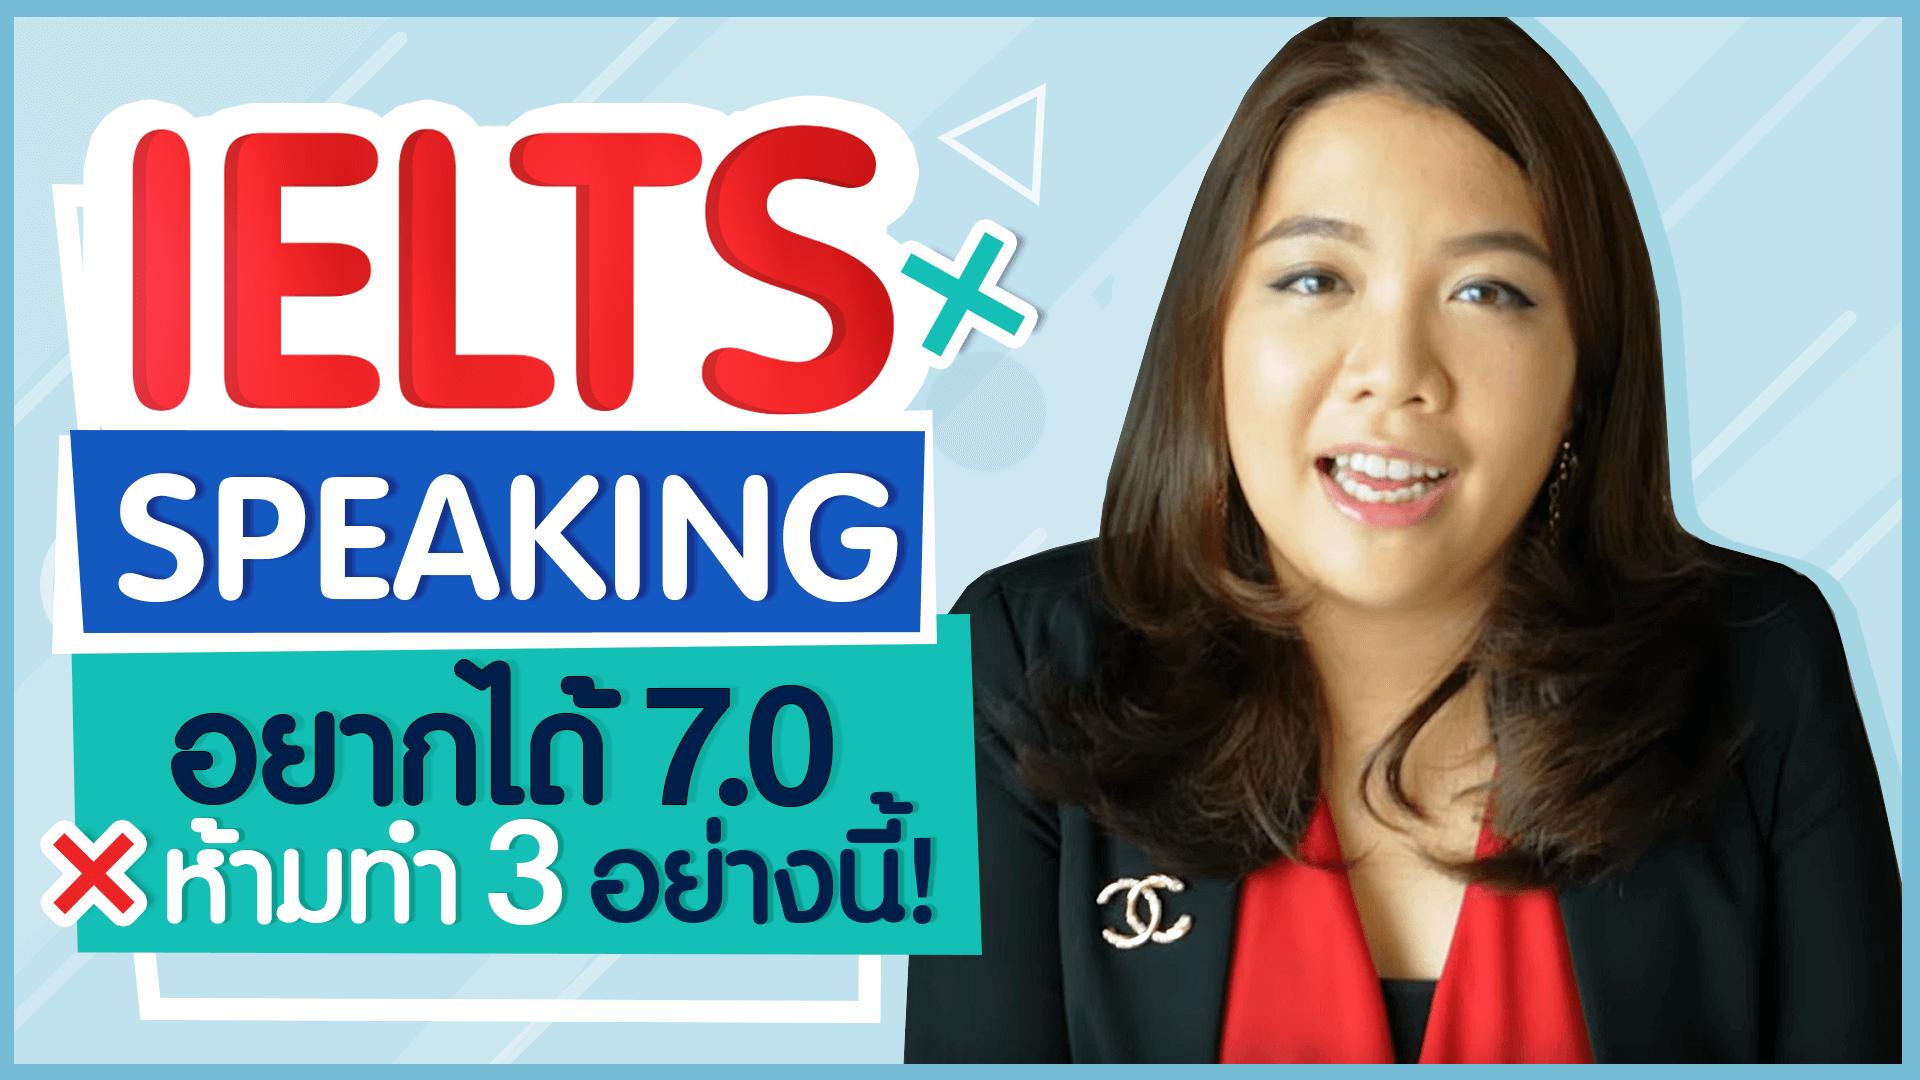 IELTS SPEAKING TEST : ห้ามทำ 3 อย่างนี้!